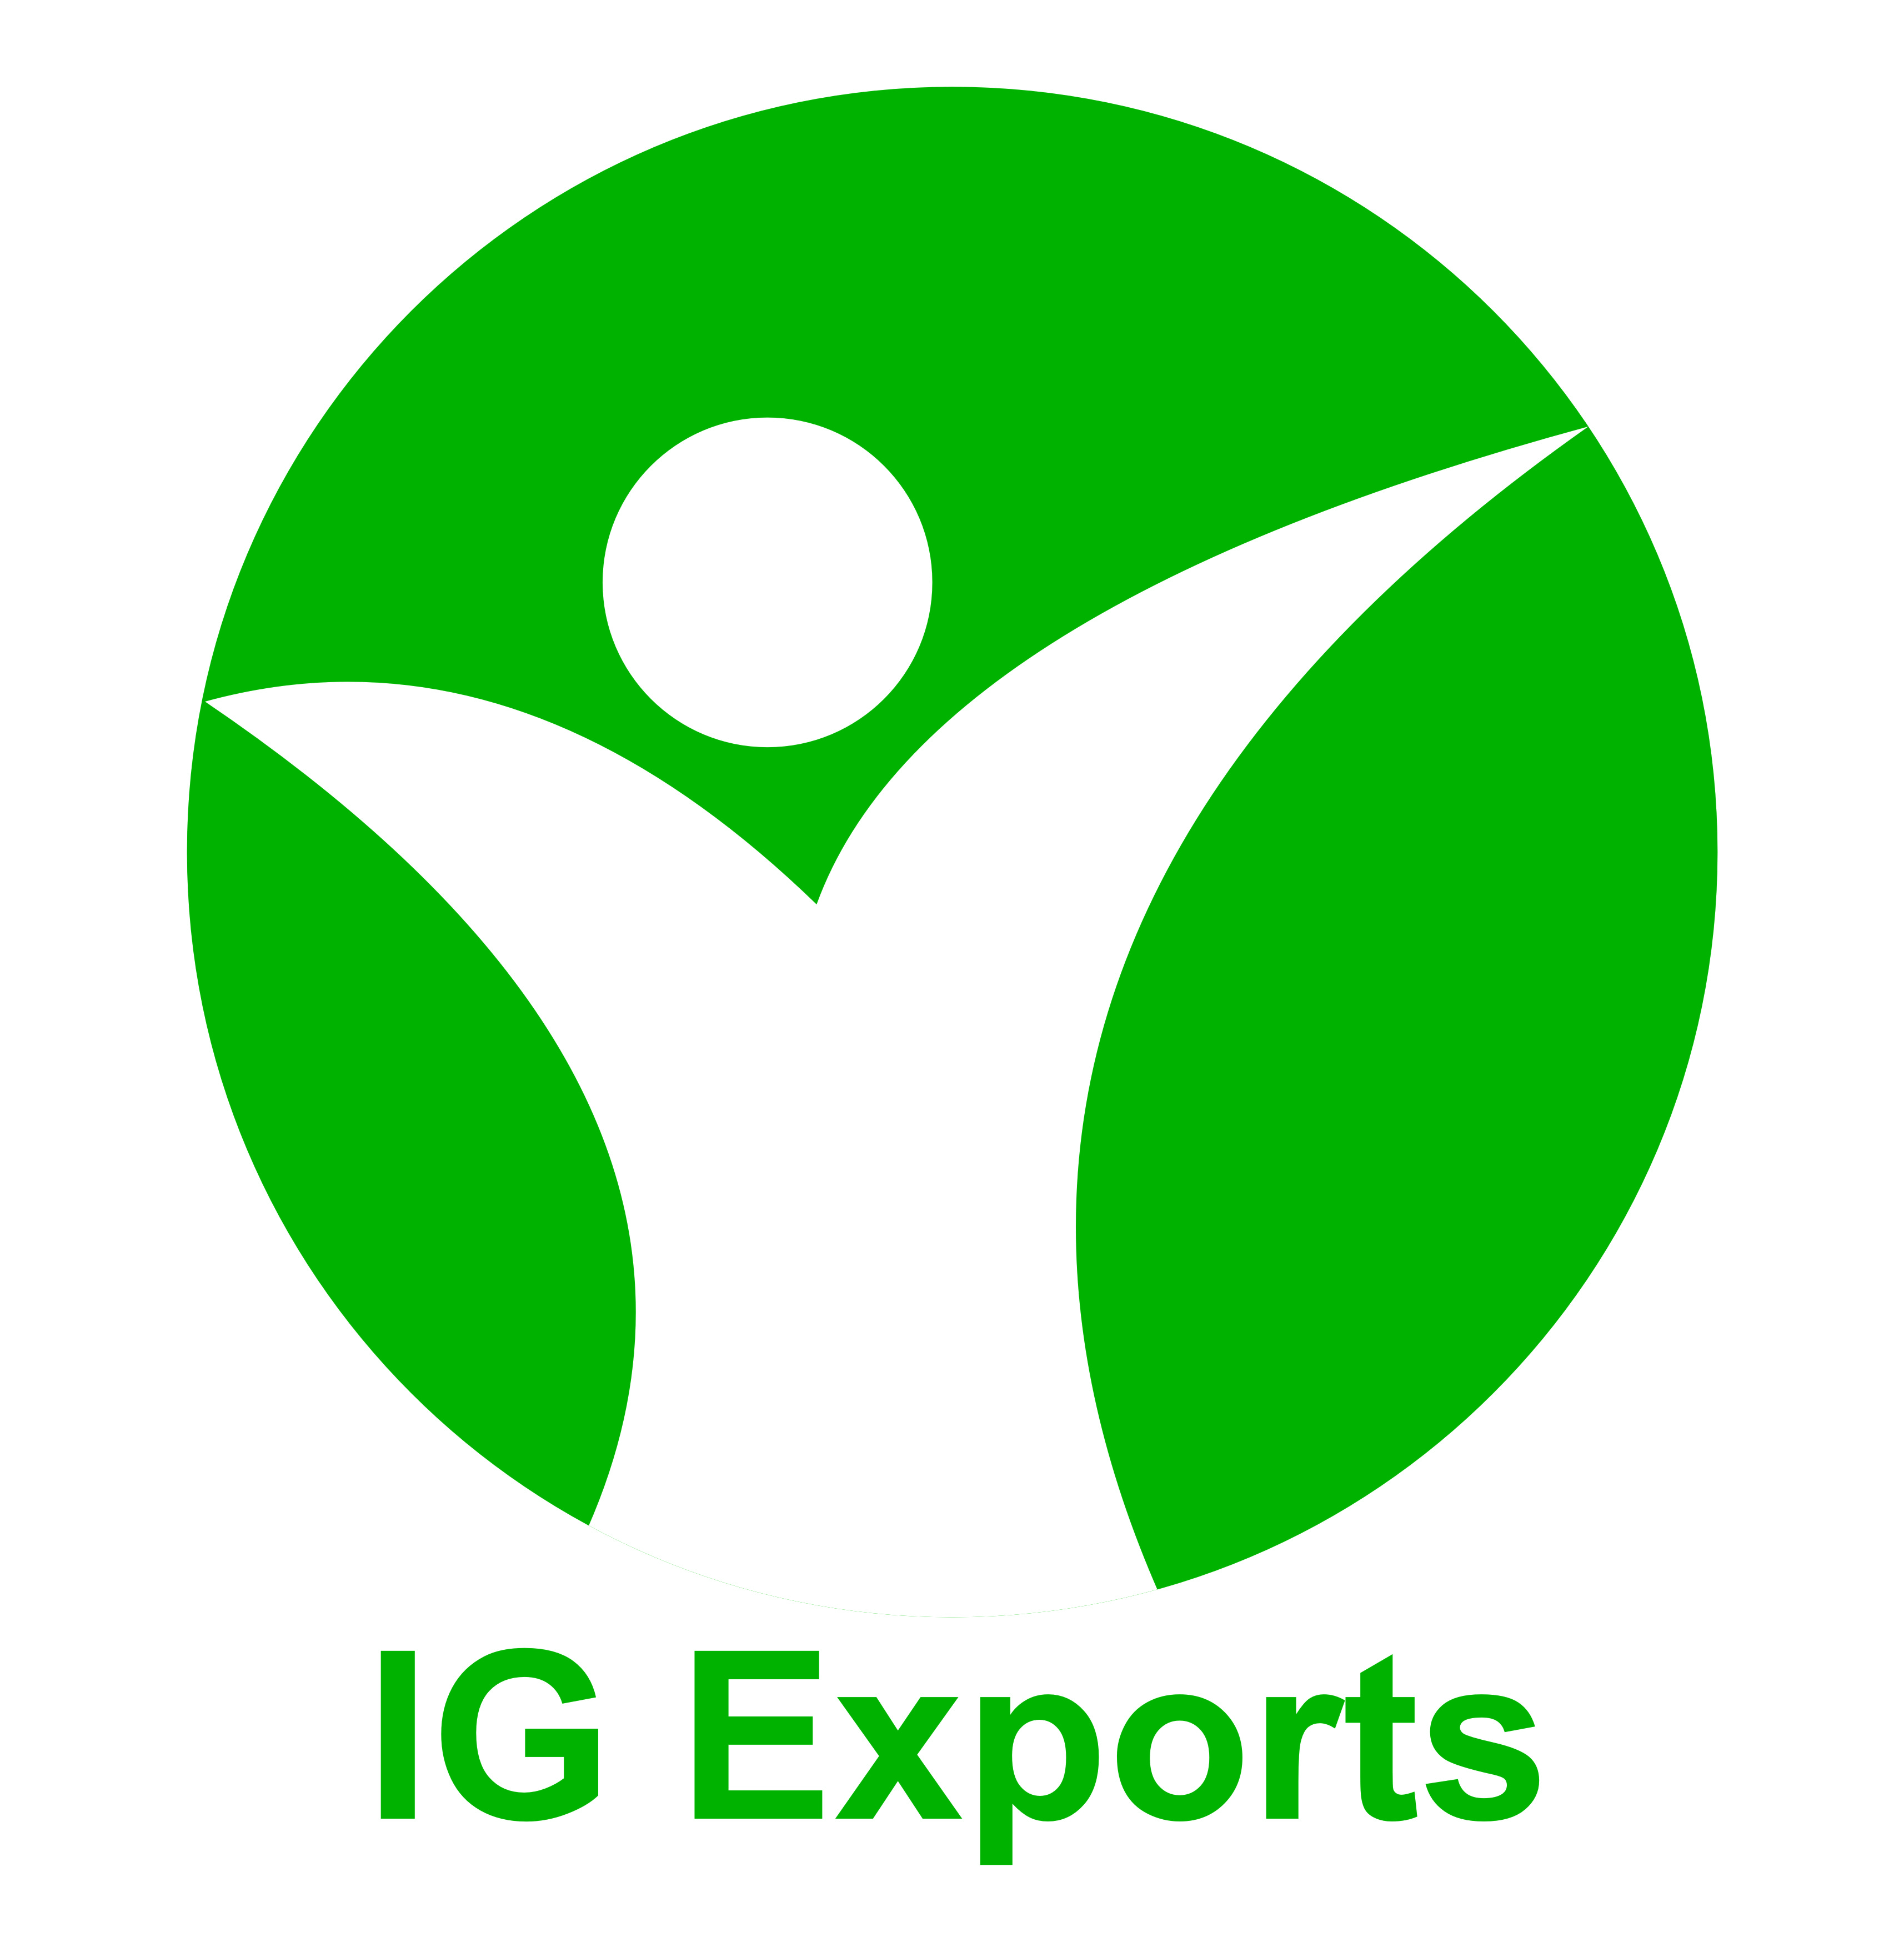 IG Exports